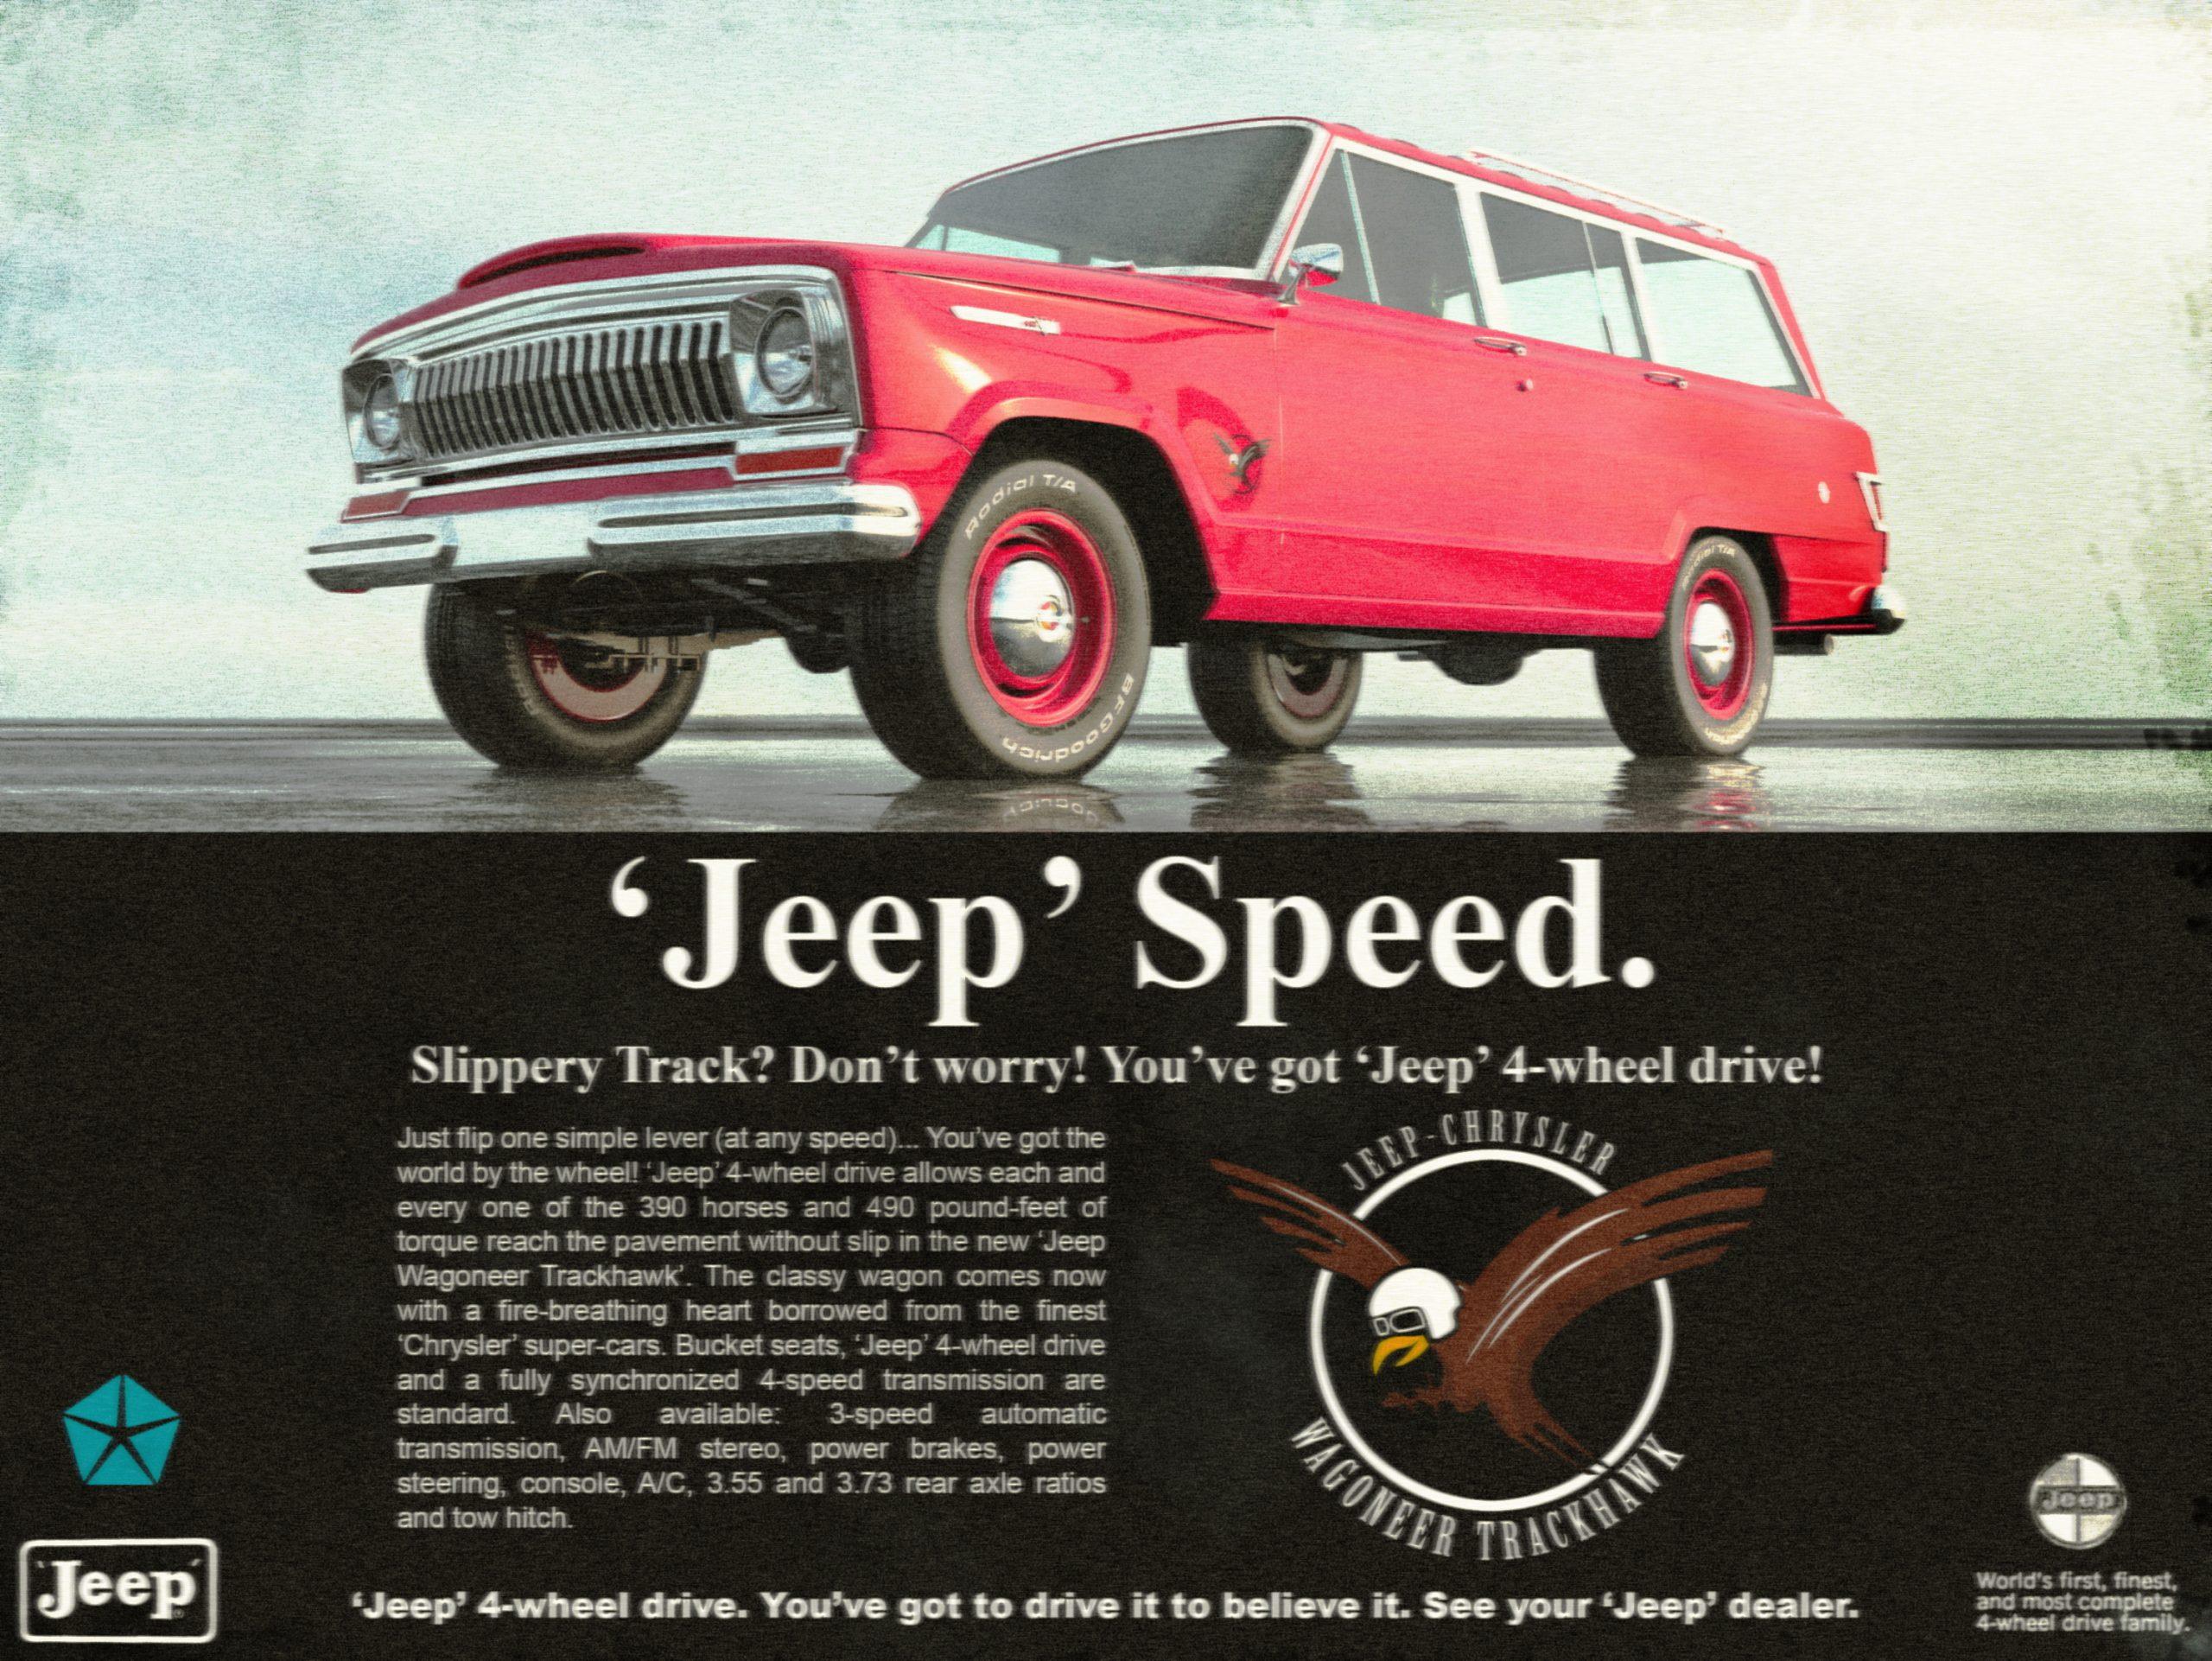 Wagoneer Trackhawk Ad abimelec